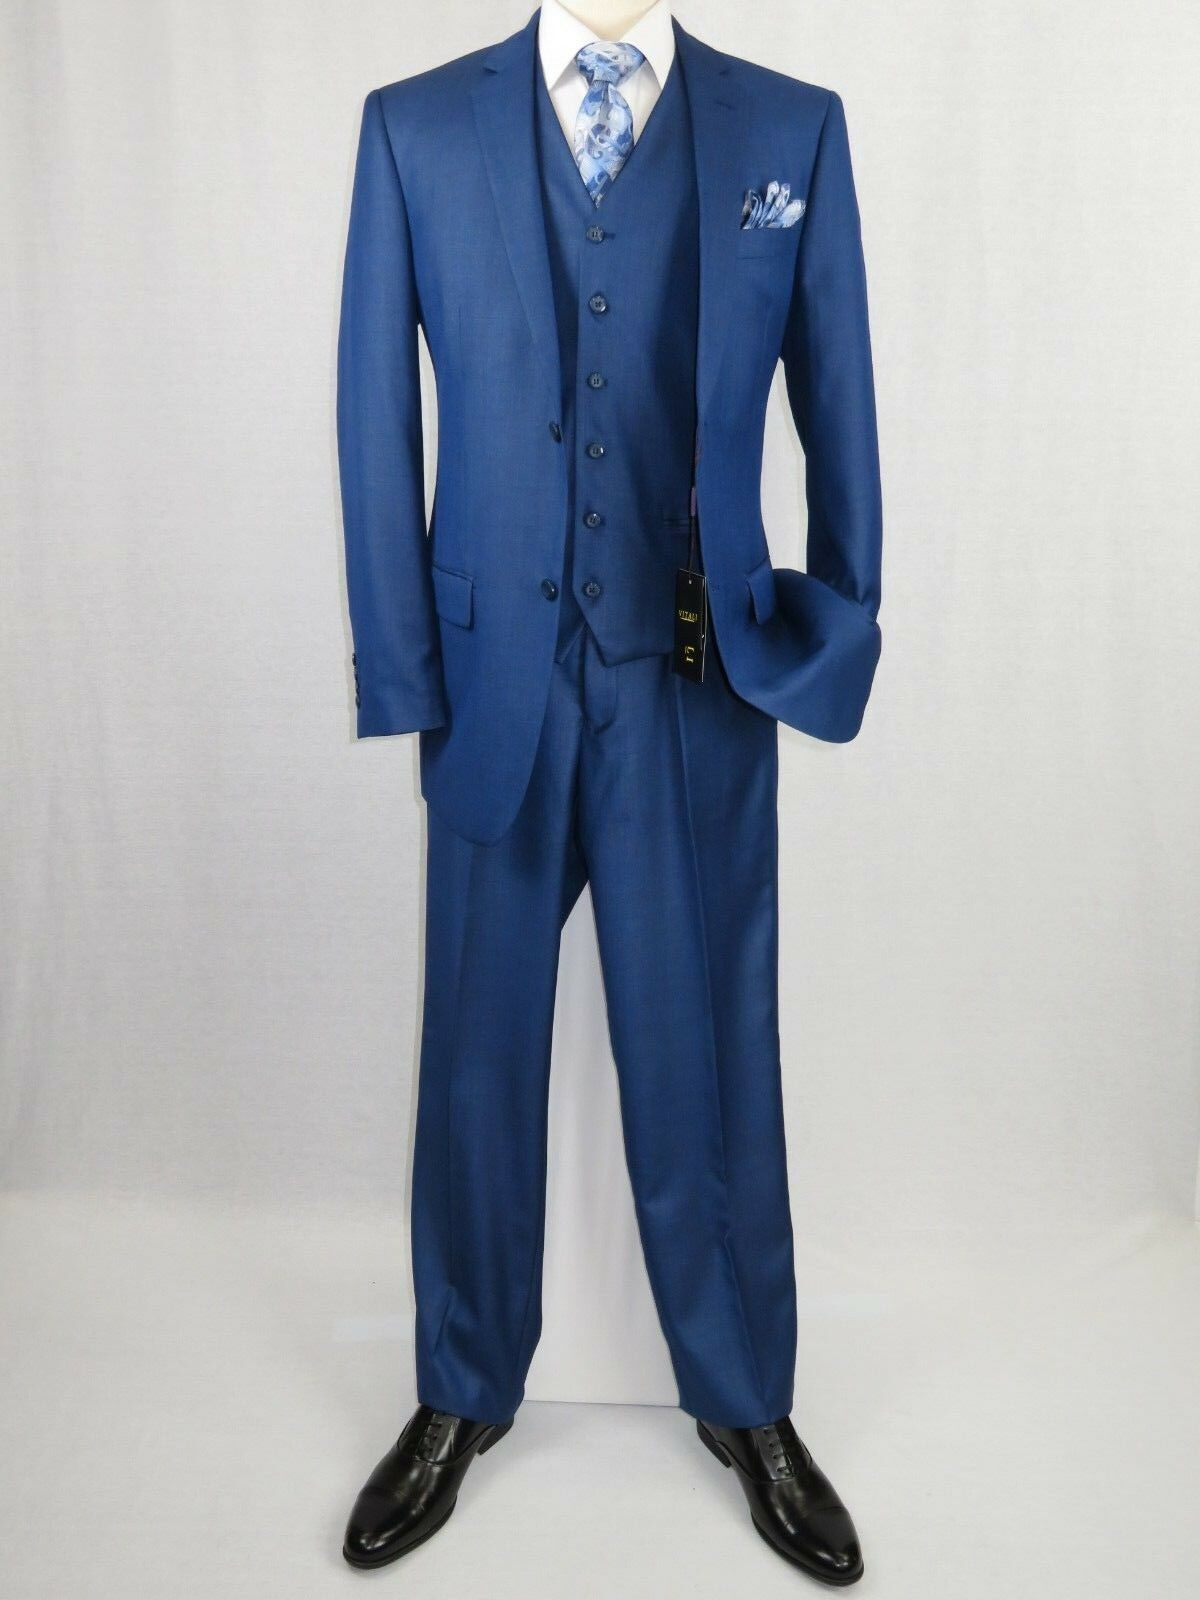 Herren Vitali Three Piece Suit Vested Shiny Sharkskin M3090 Royal Blau Pleated